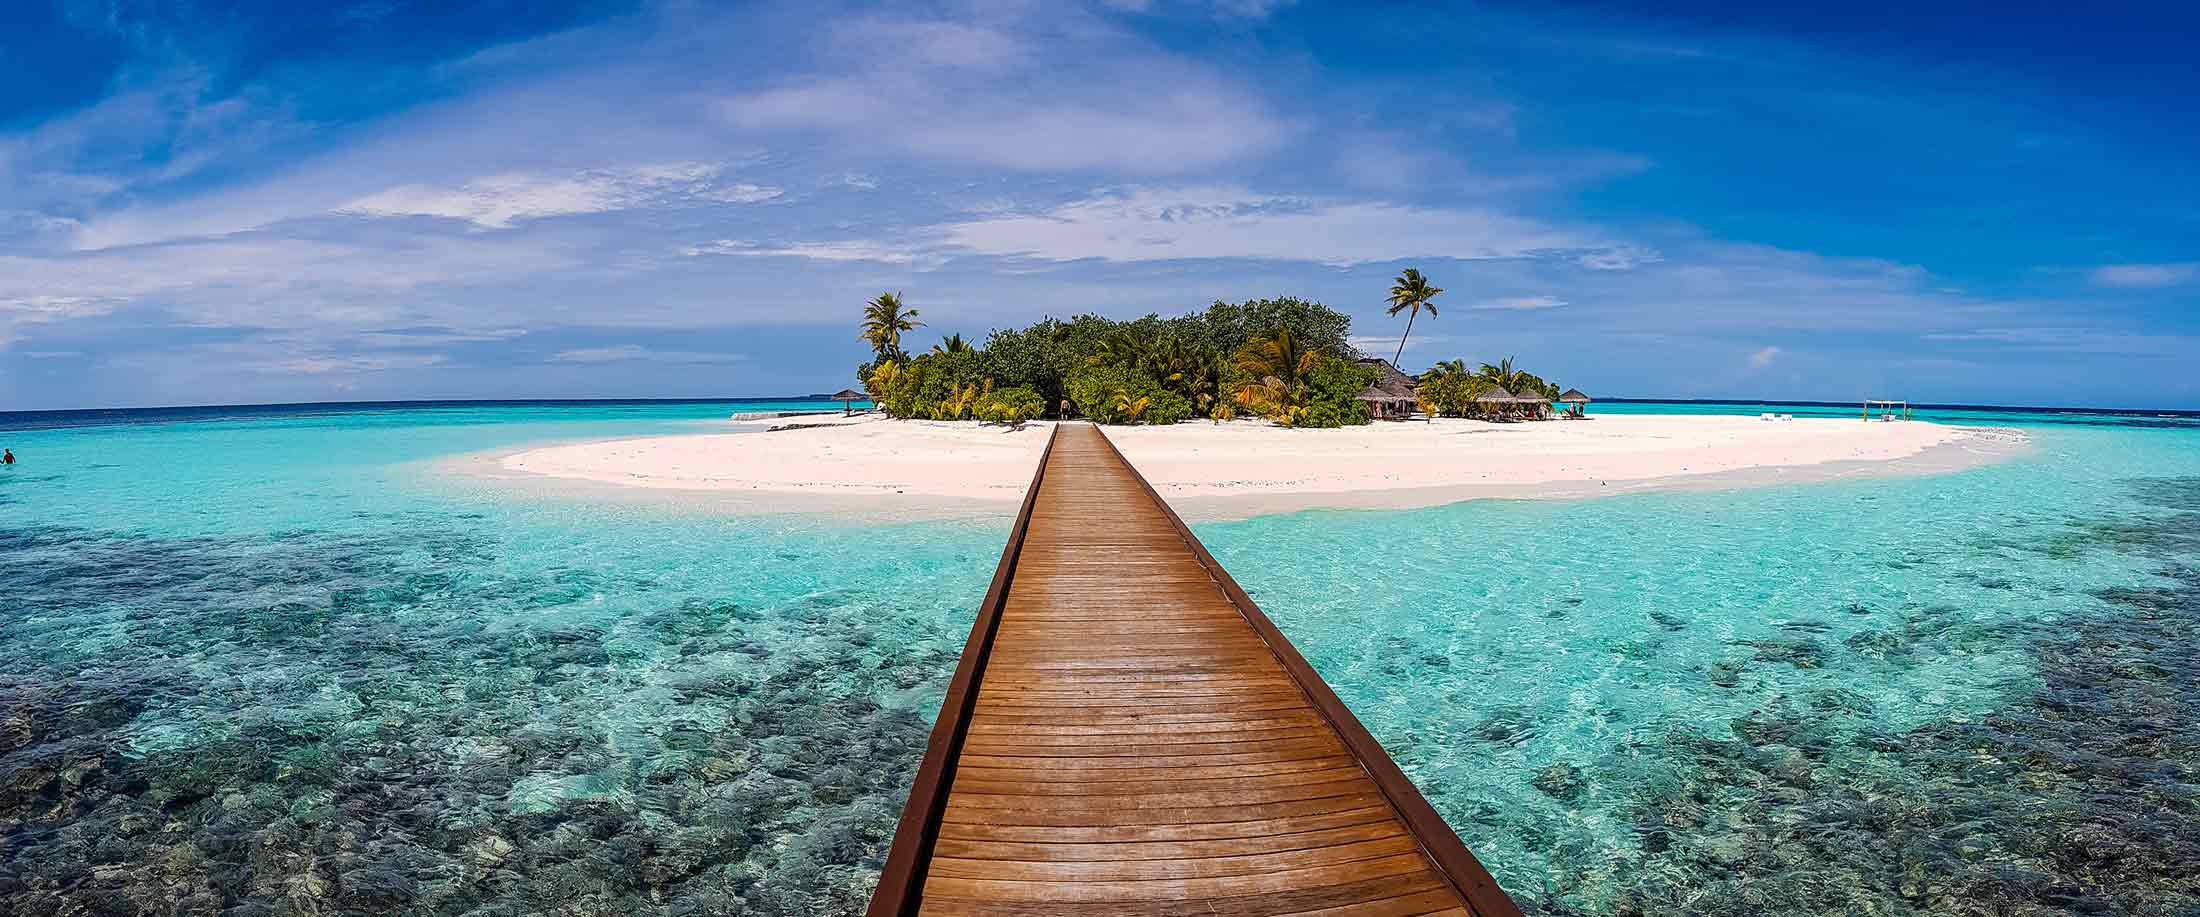 UNWTO: Small Island Destinations' tourism plummets